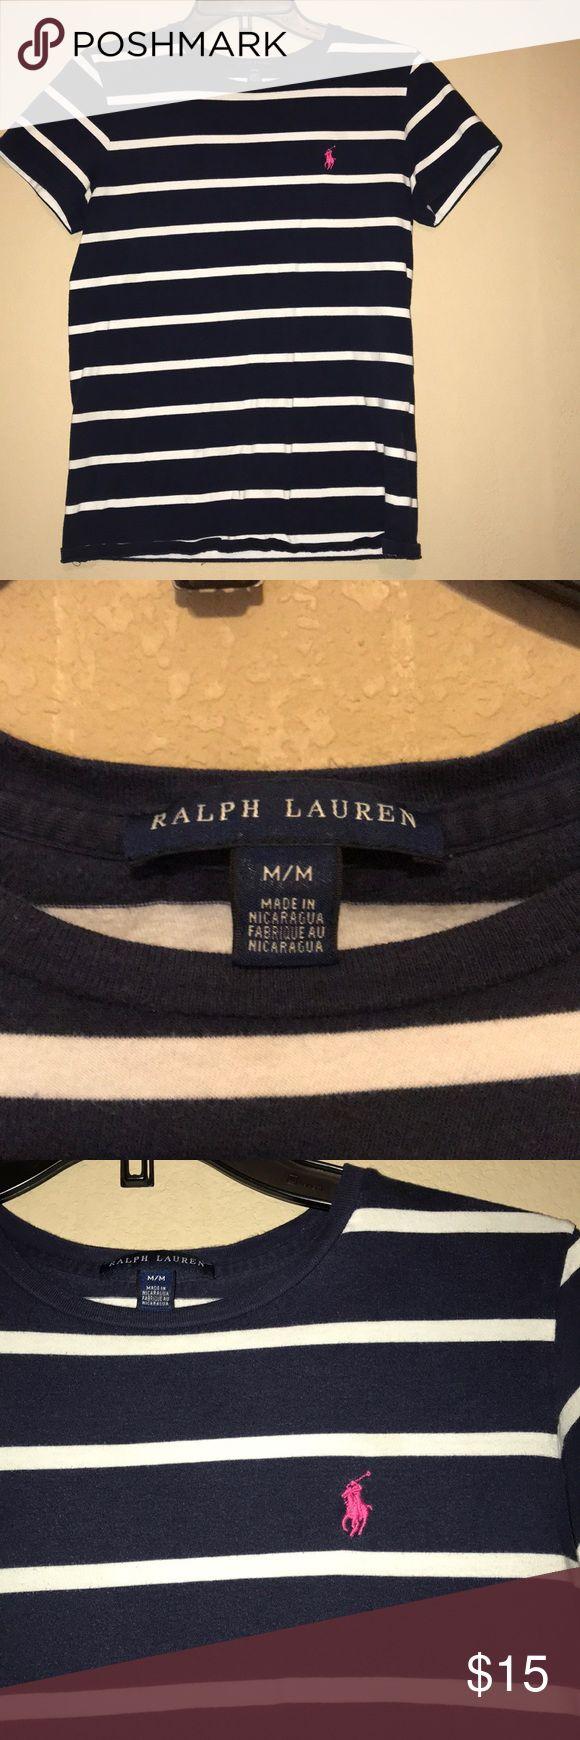 Ralph Lauren shirt Navy blue & white striped tee is a size medium with a pink horse. Looks brand new Ralph Lauren Tops Tees - Short Sleeve